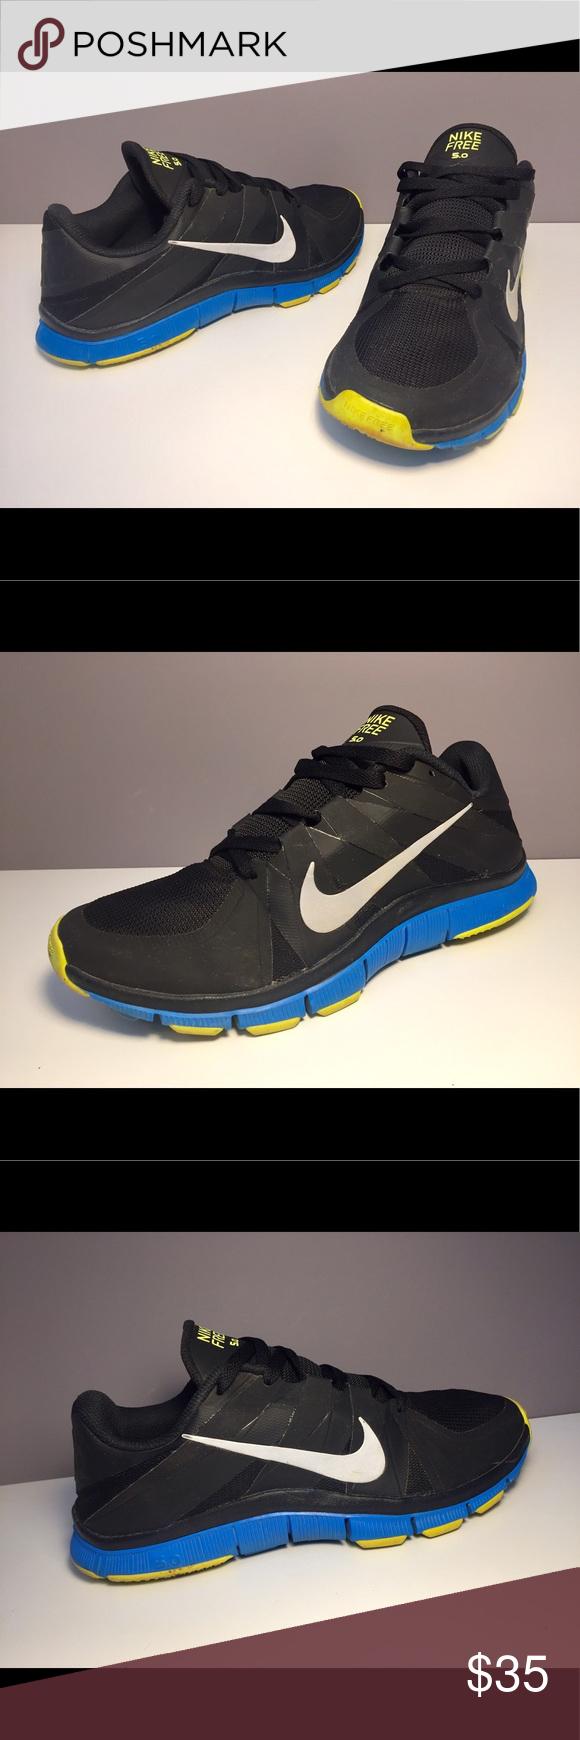 411a589e93fc Men s Nike Free Run 5.0 Shoes Men s Nike Free Run 5.0 Shoes - Size 10 -  Black